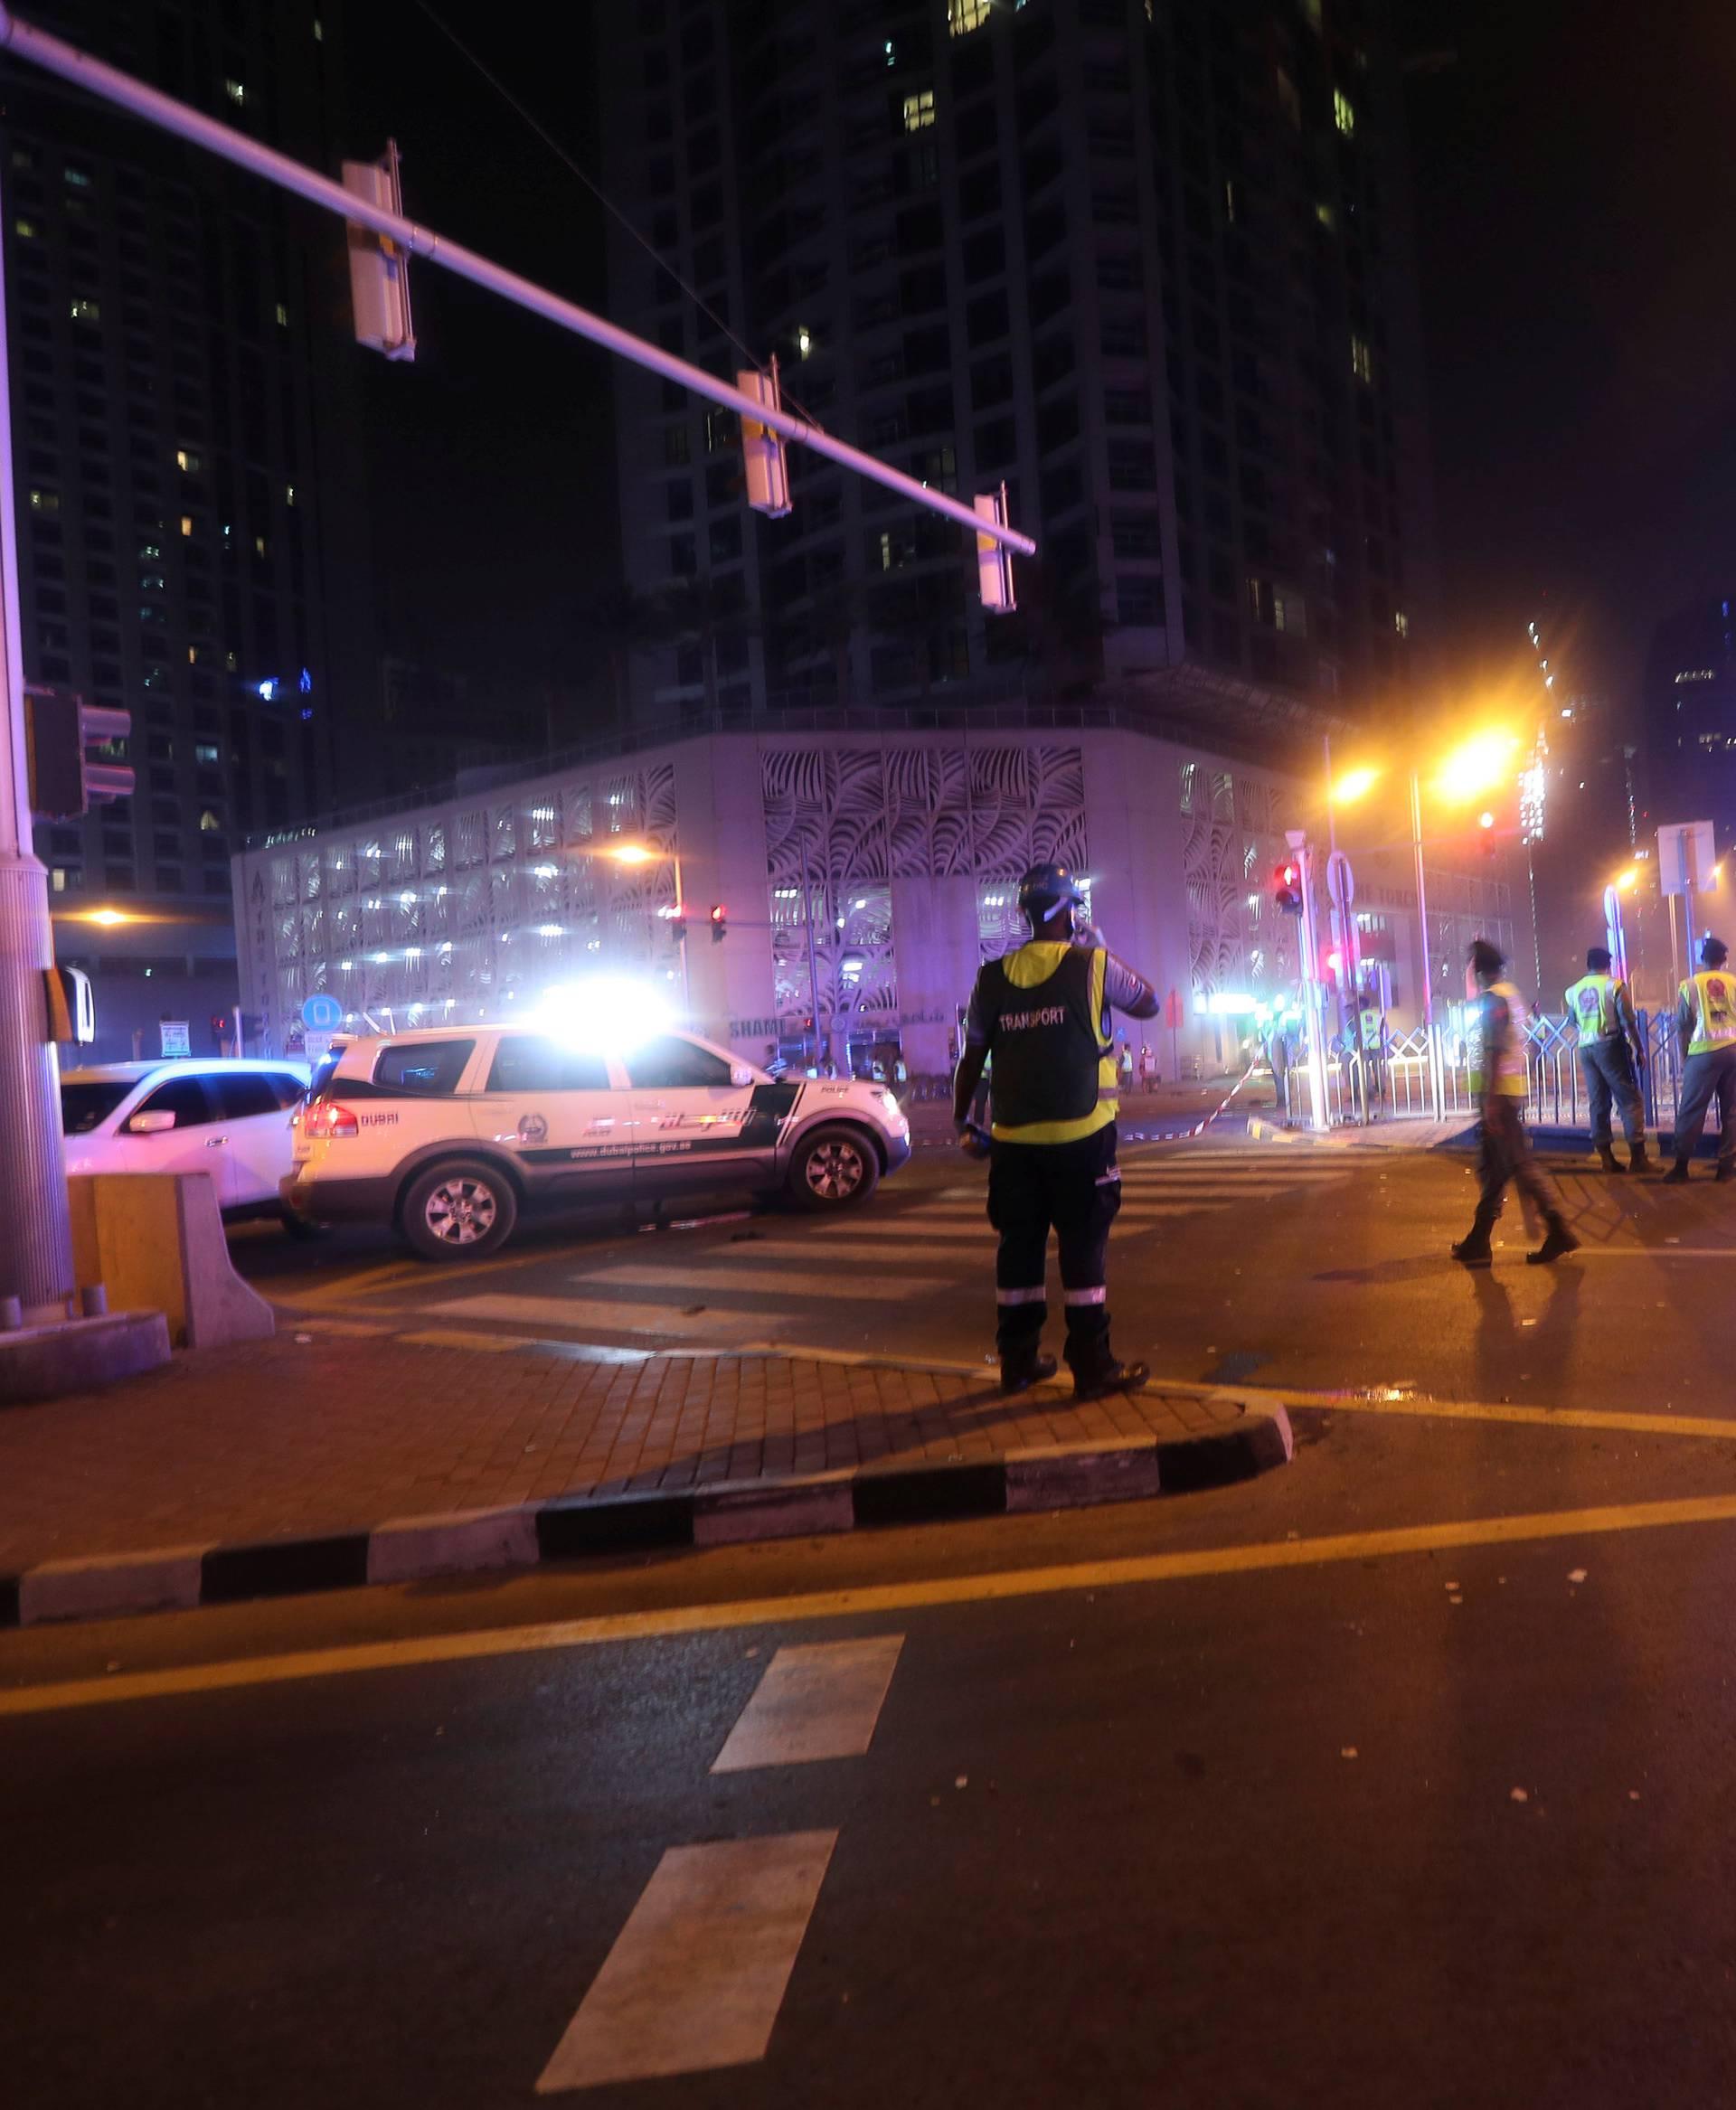 Dubai Emergency Response teams and Dubai police are seen on the street near Dubai's Torch tower residential building in the Marina district, Dubai